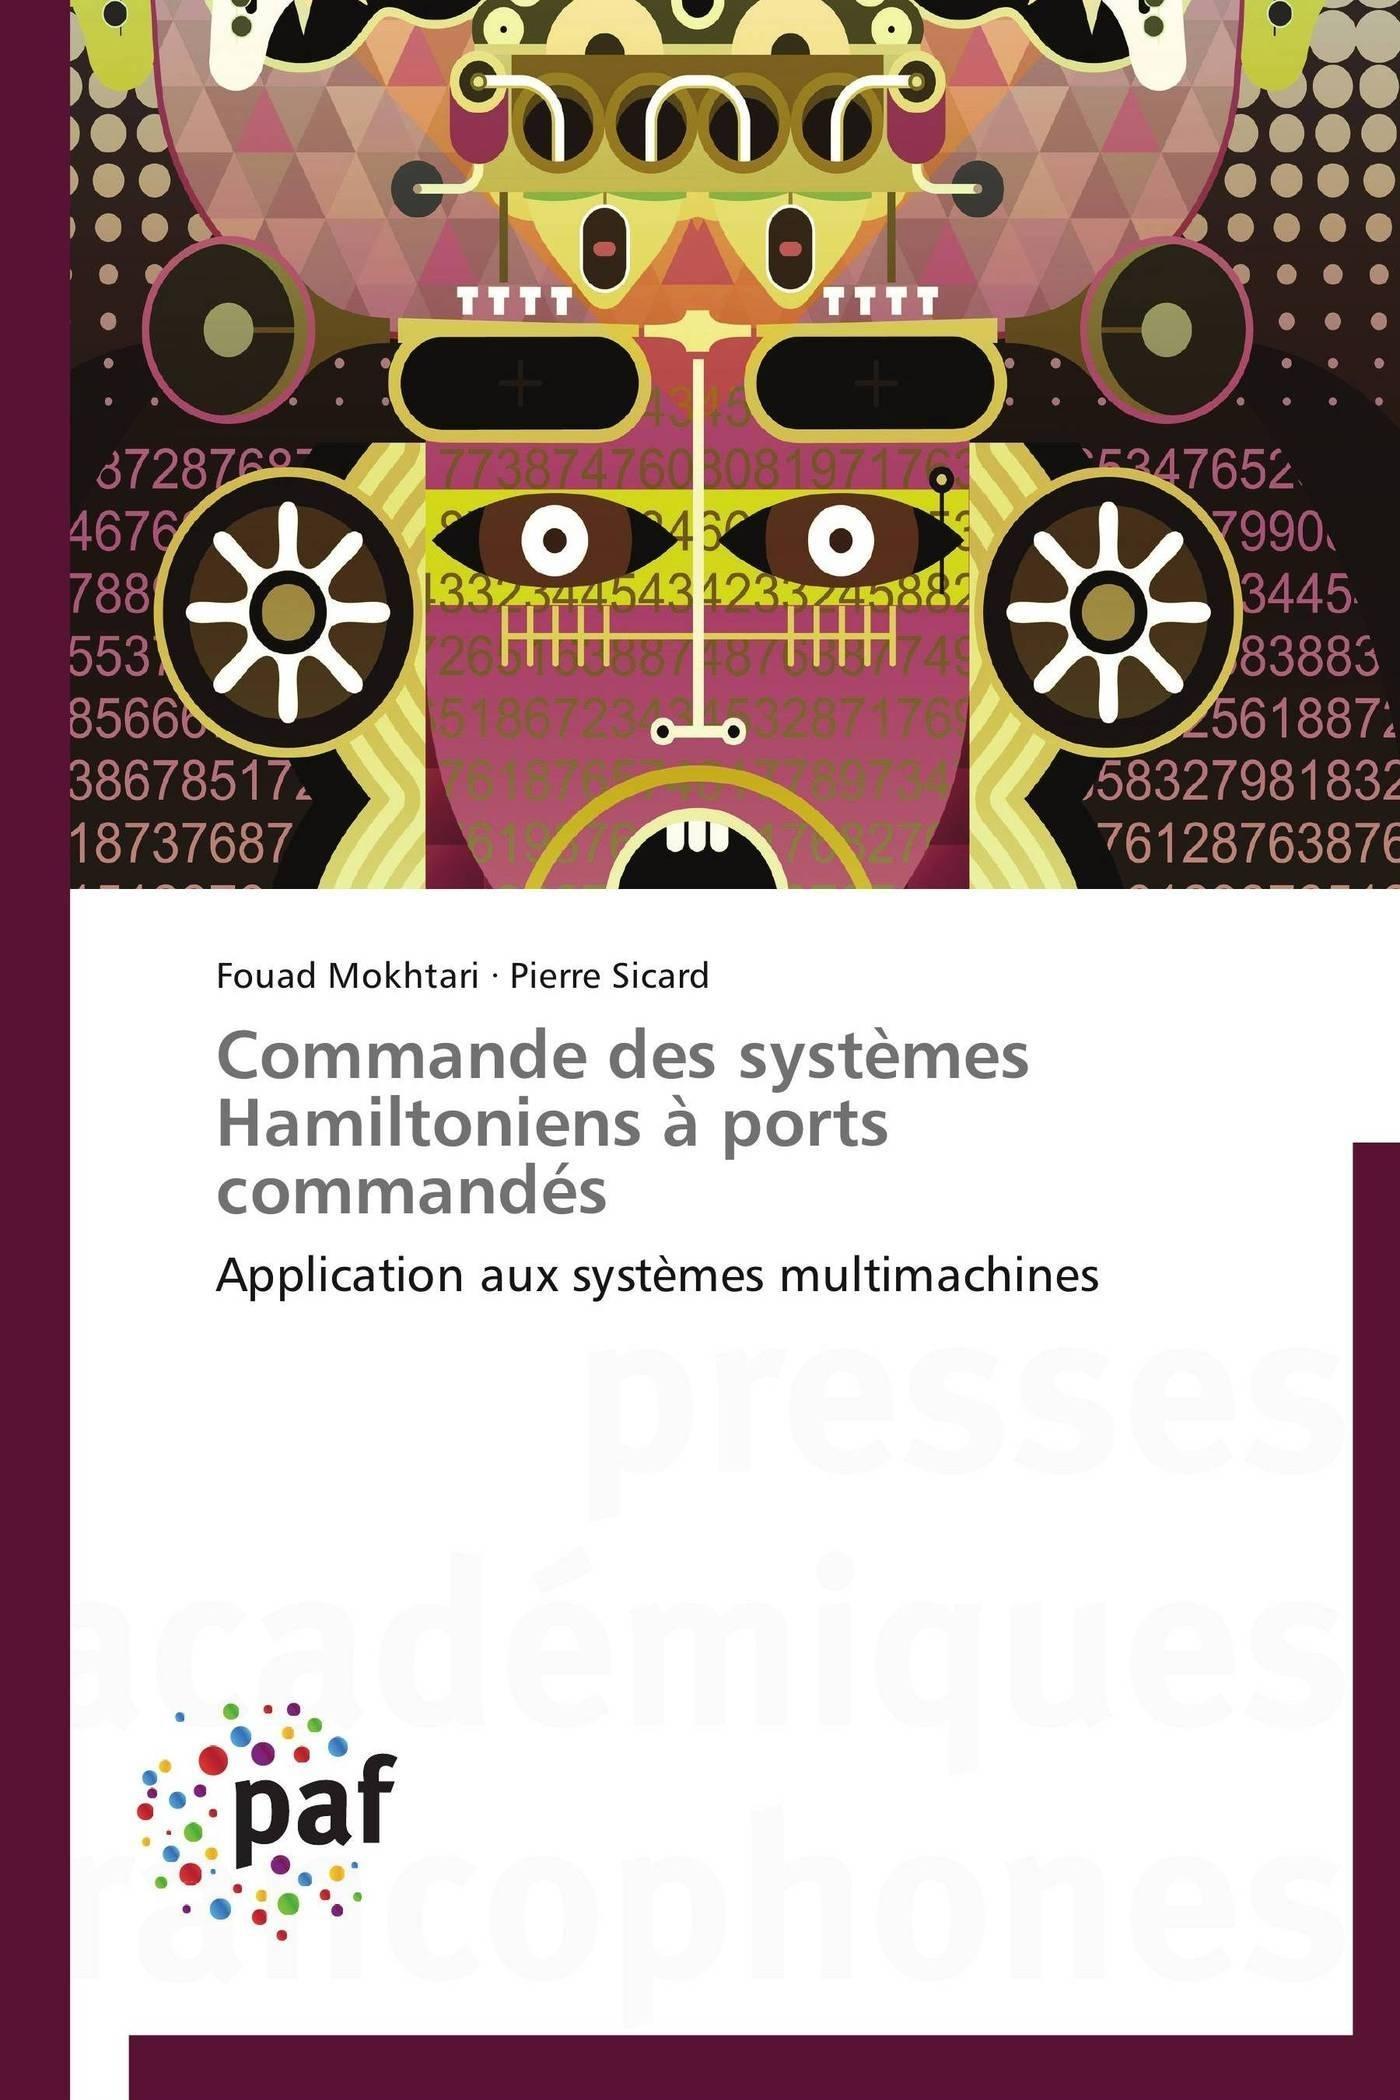 COMMANDE DES SYSTEMES HAMILTONIENS A PORTS COMMANDES